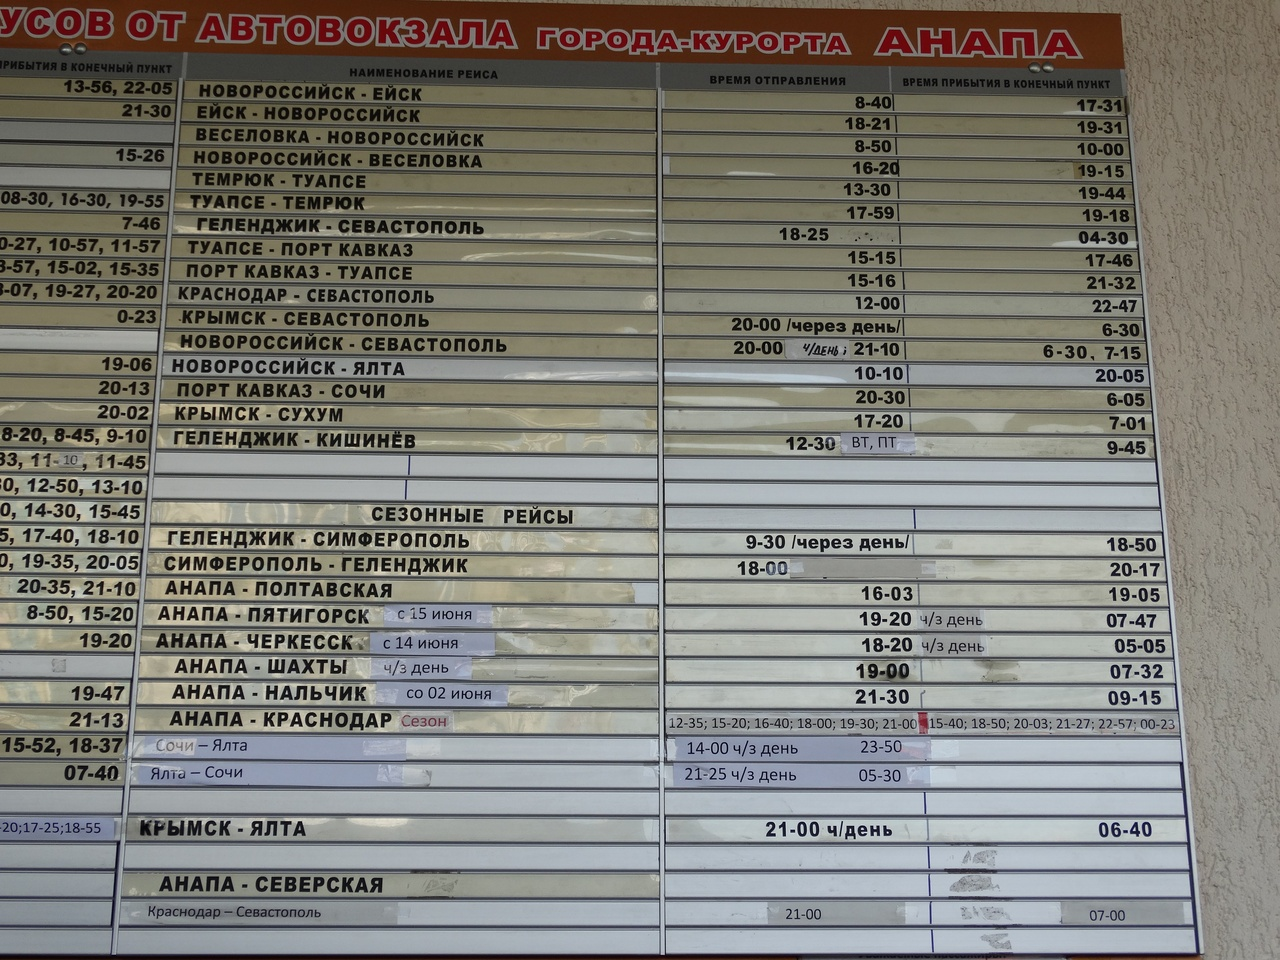 Автобус севастополь анапа отзывы 199